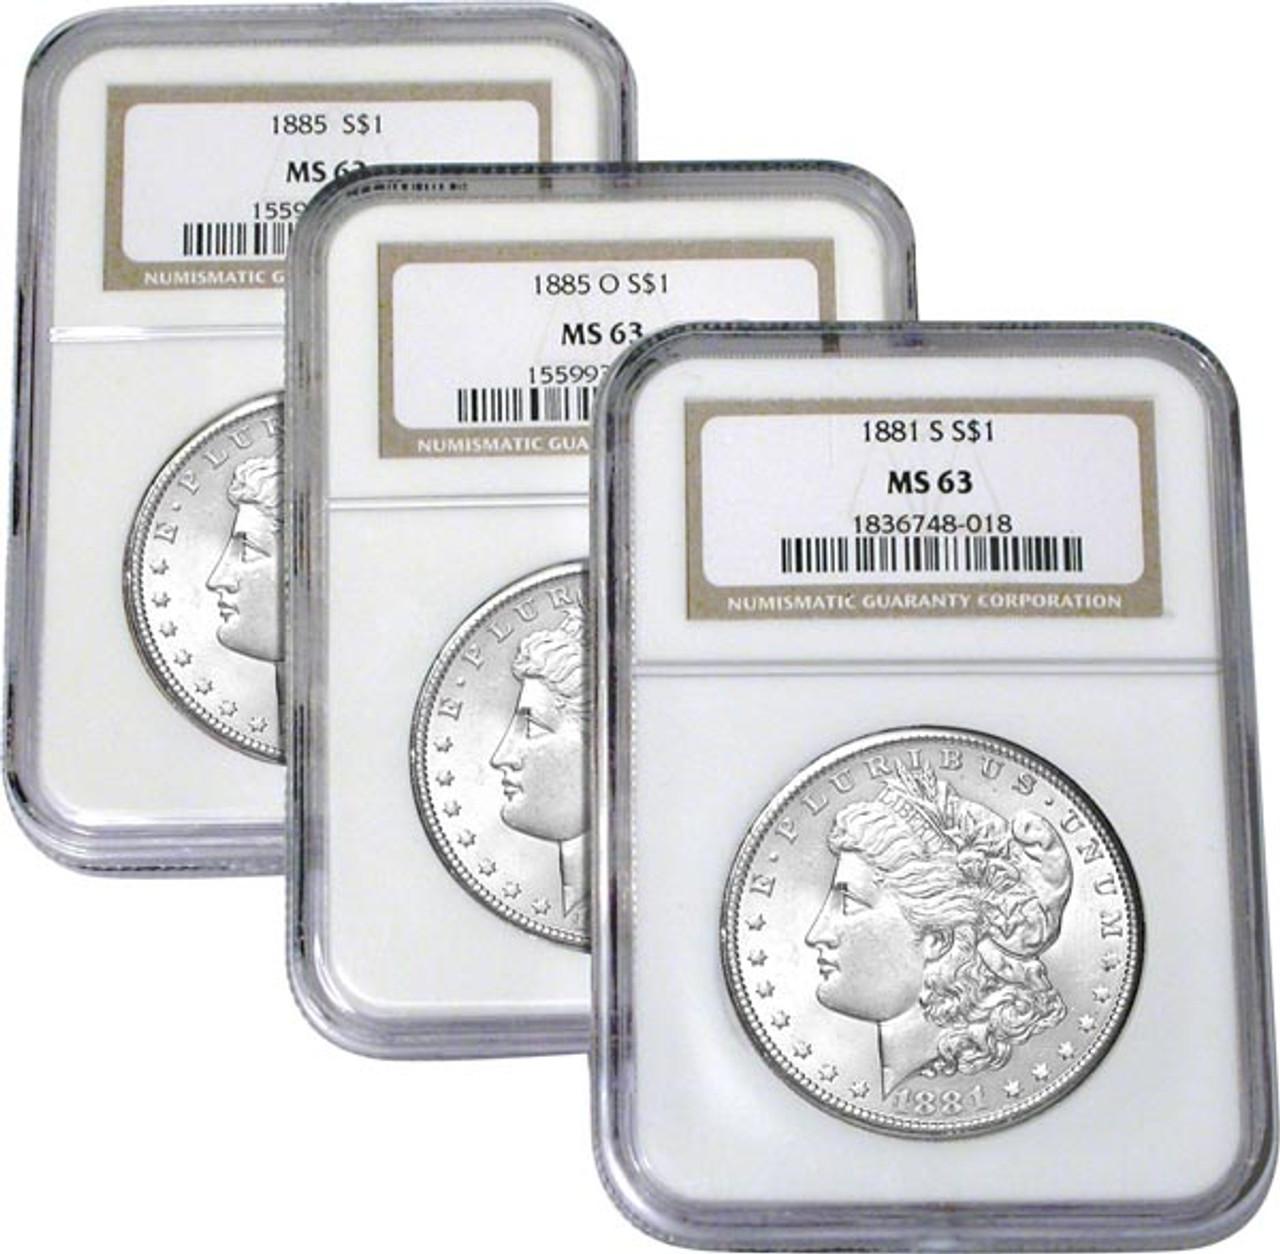 MS63 Certified Morgan Silver Dollar